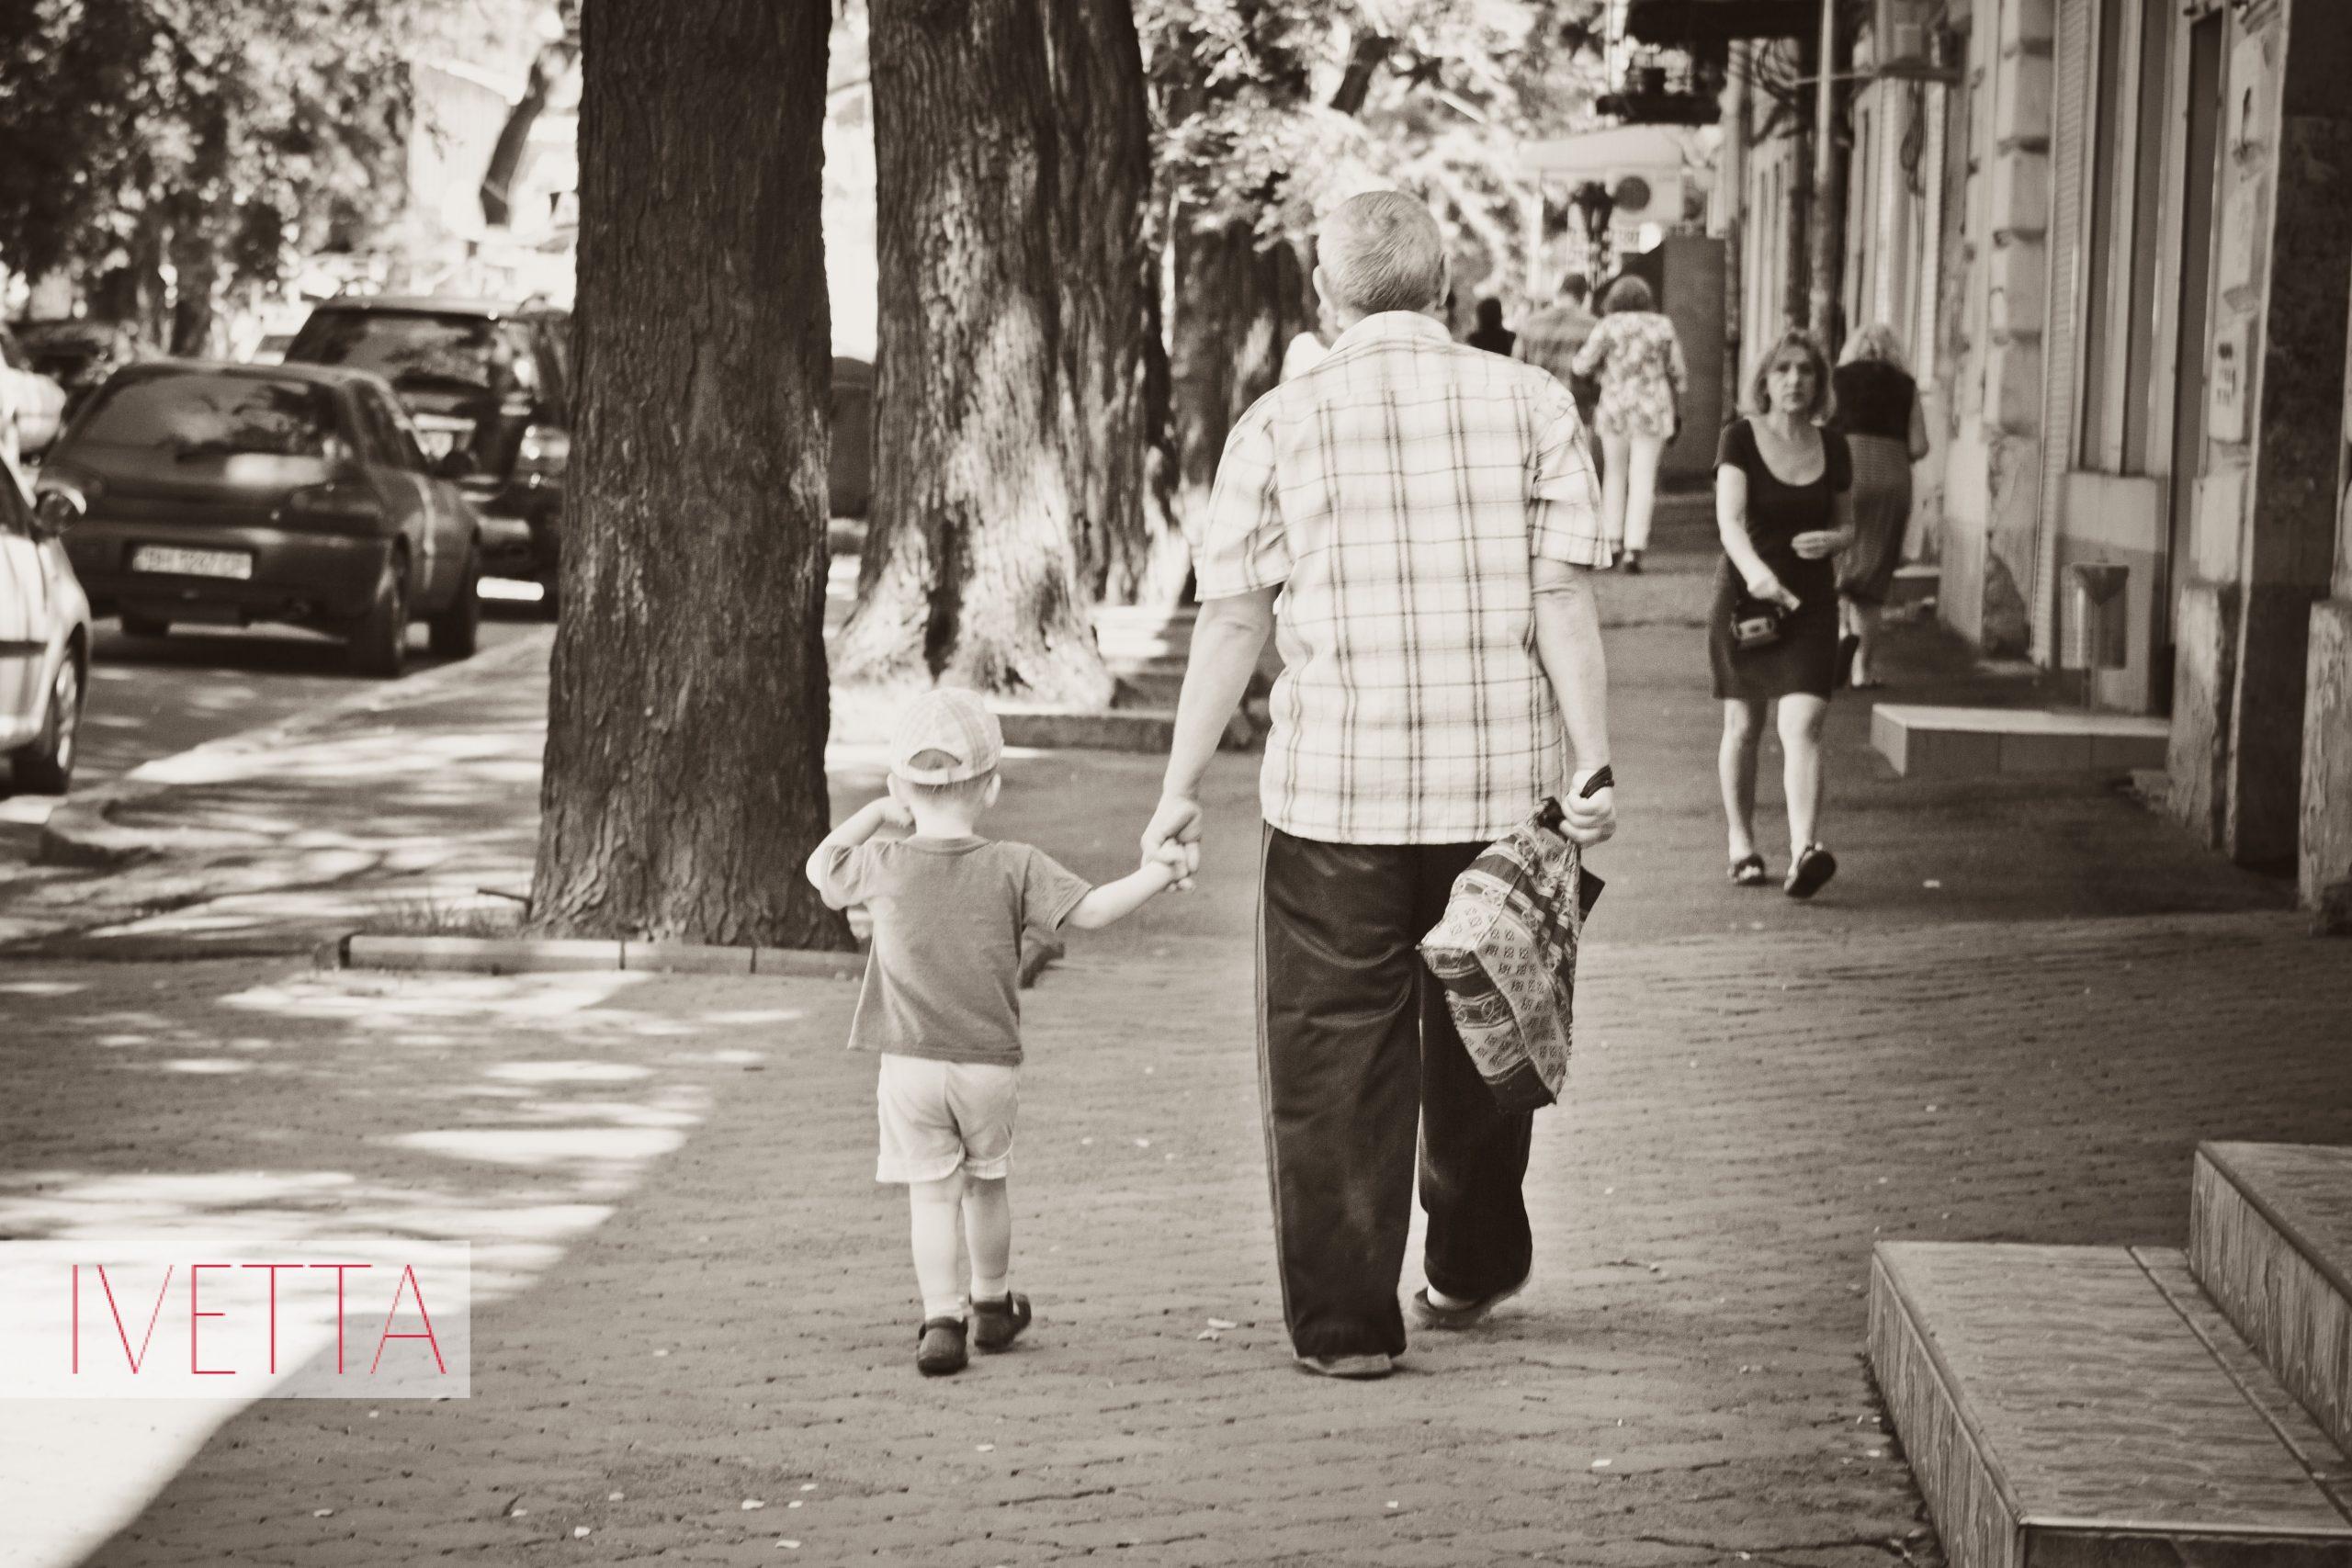 Дедушка с внуком идут по Одессе